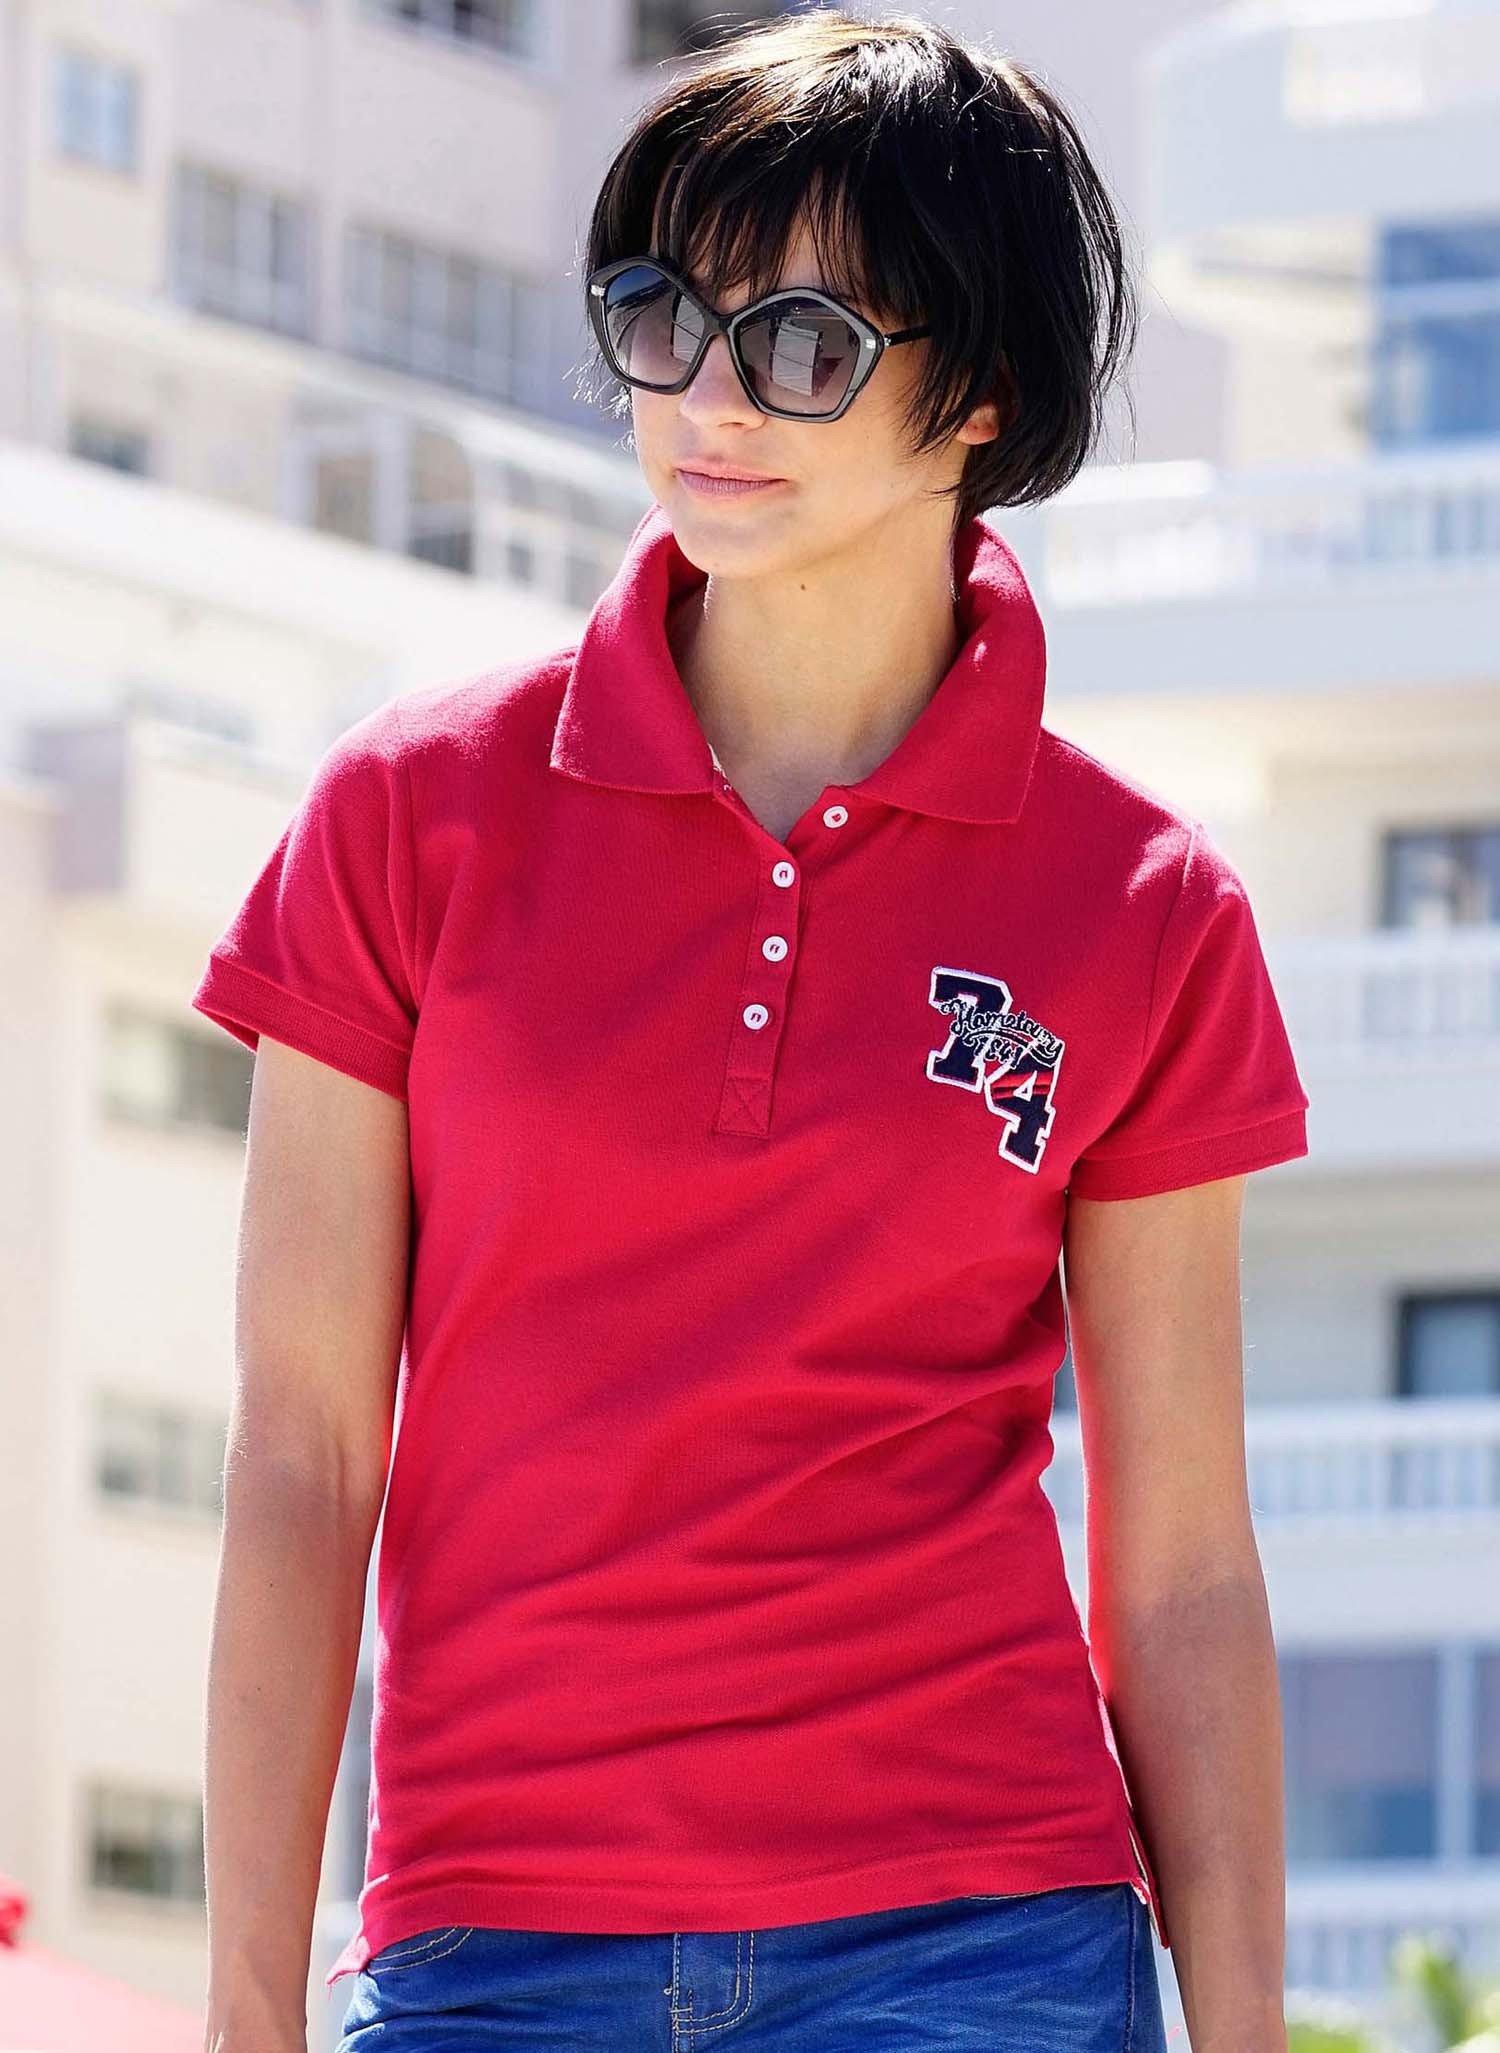 D-KA-Piquet-Polo Shirt rot L 023 - 3 - Ronja.ch